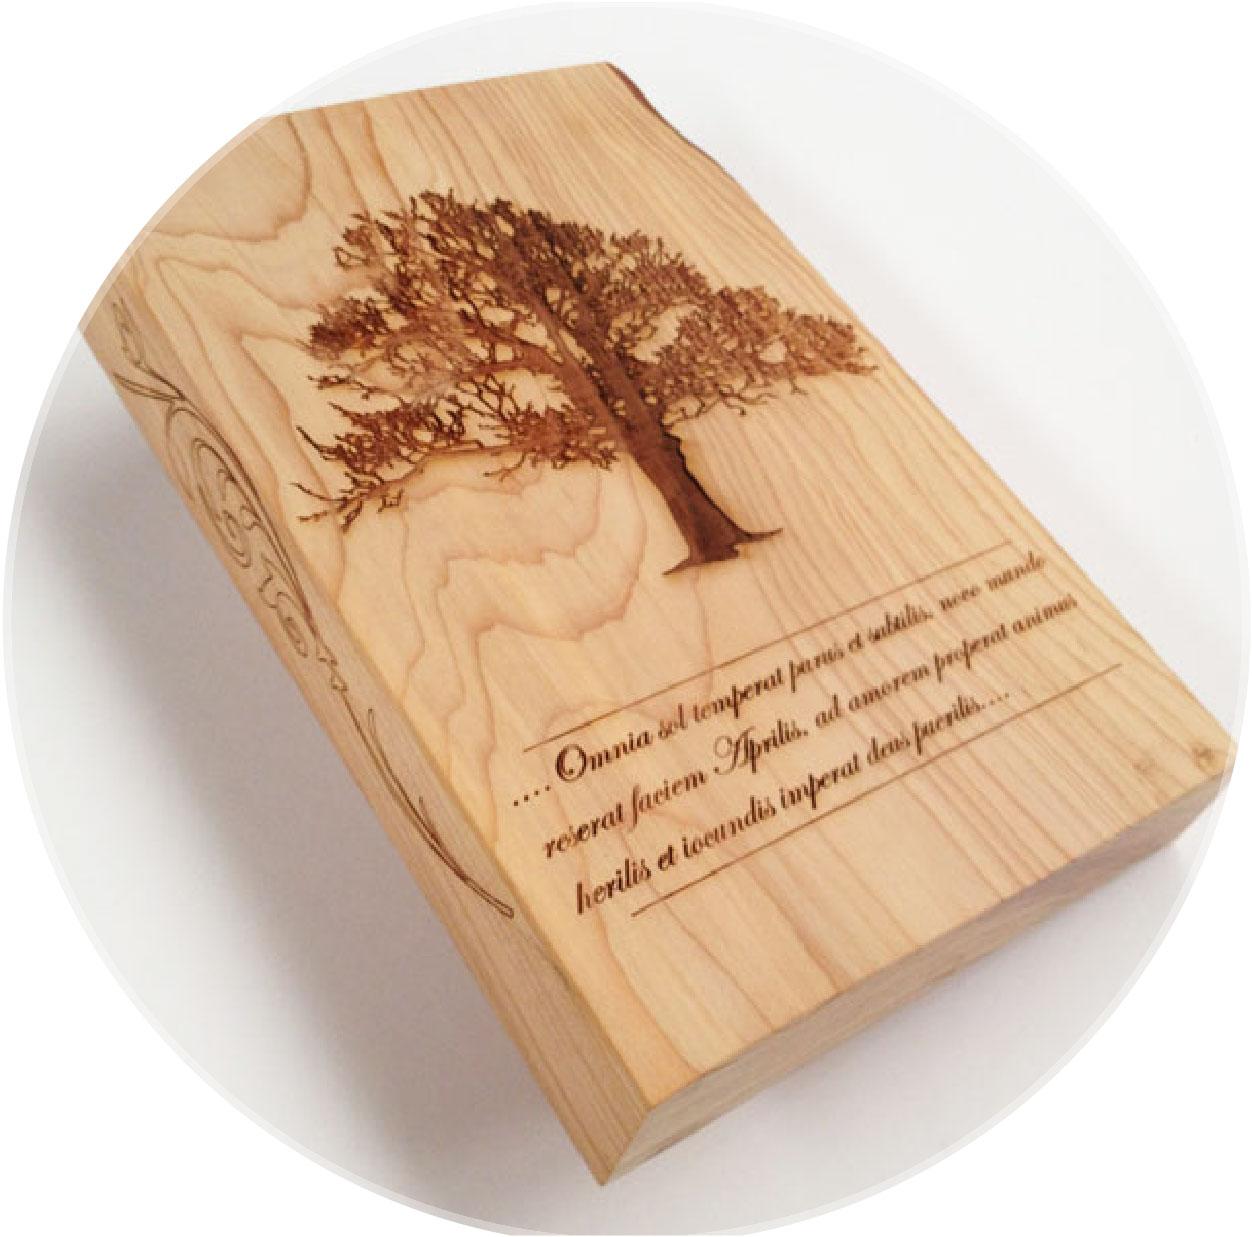 pieza de madera grabada con equipo HSCO2-30W